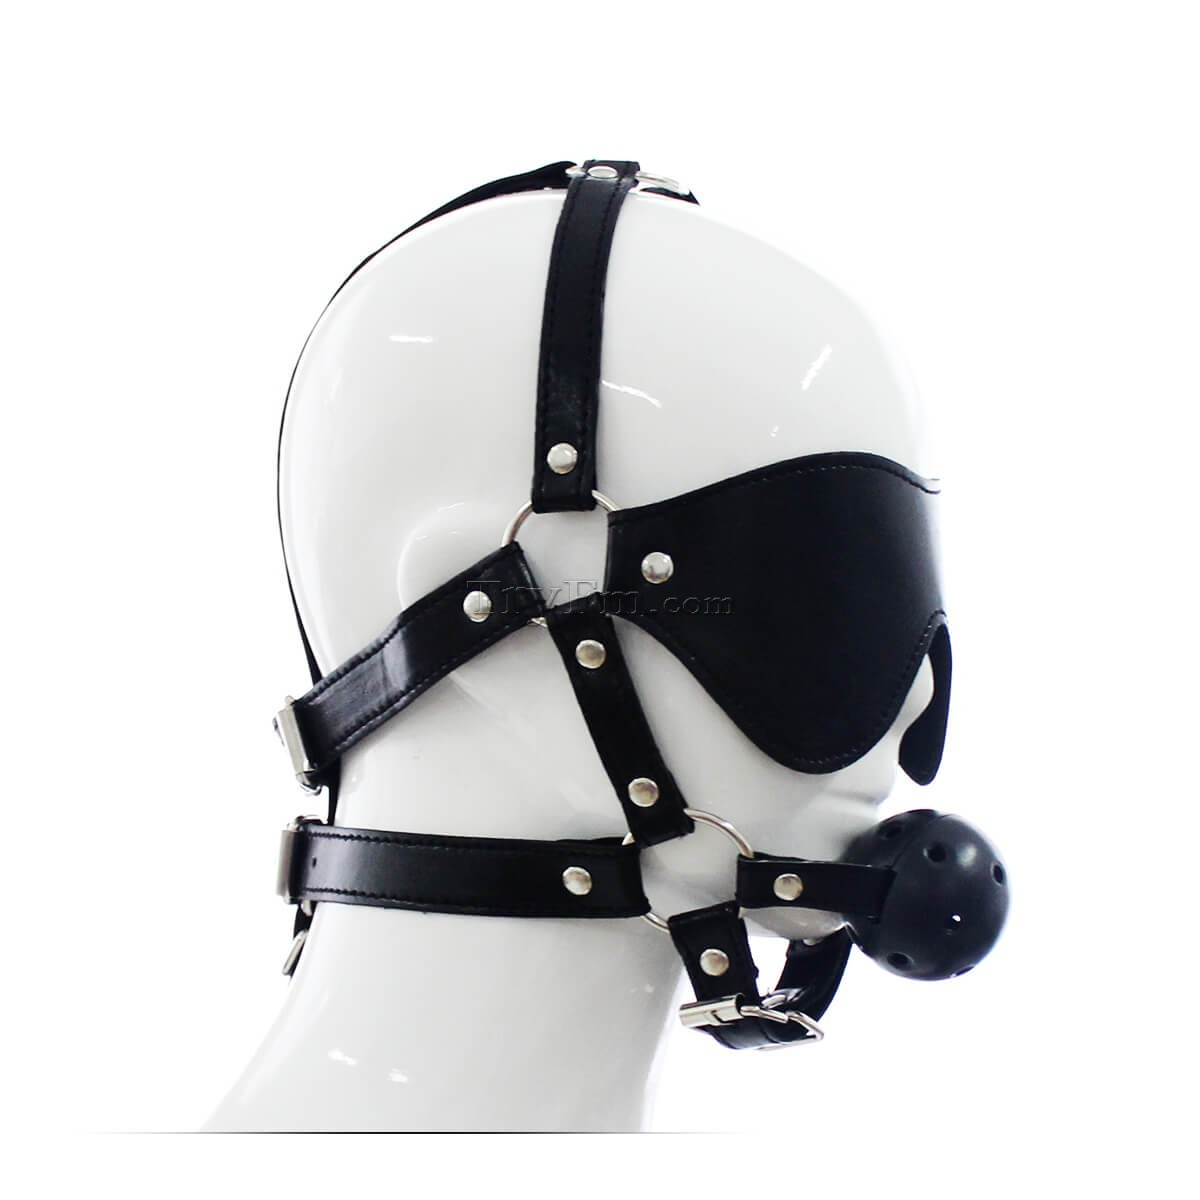 24-Blindfold-Harness-and-Ball-Gag-1.jpg